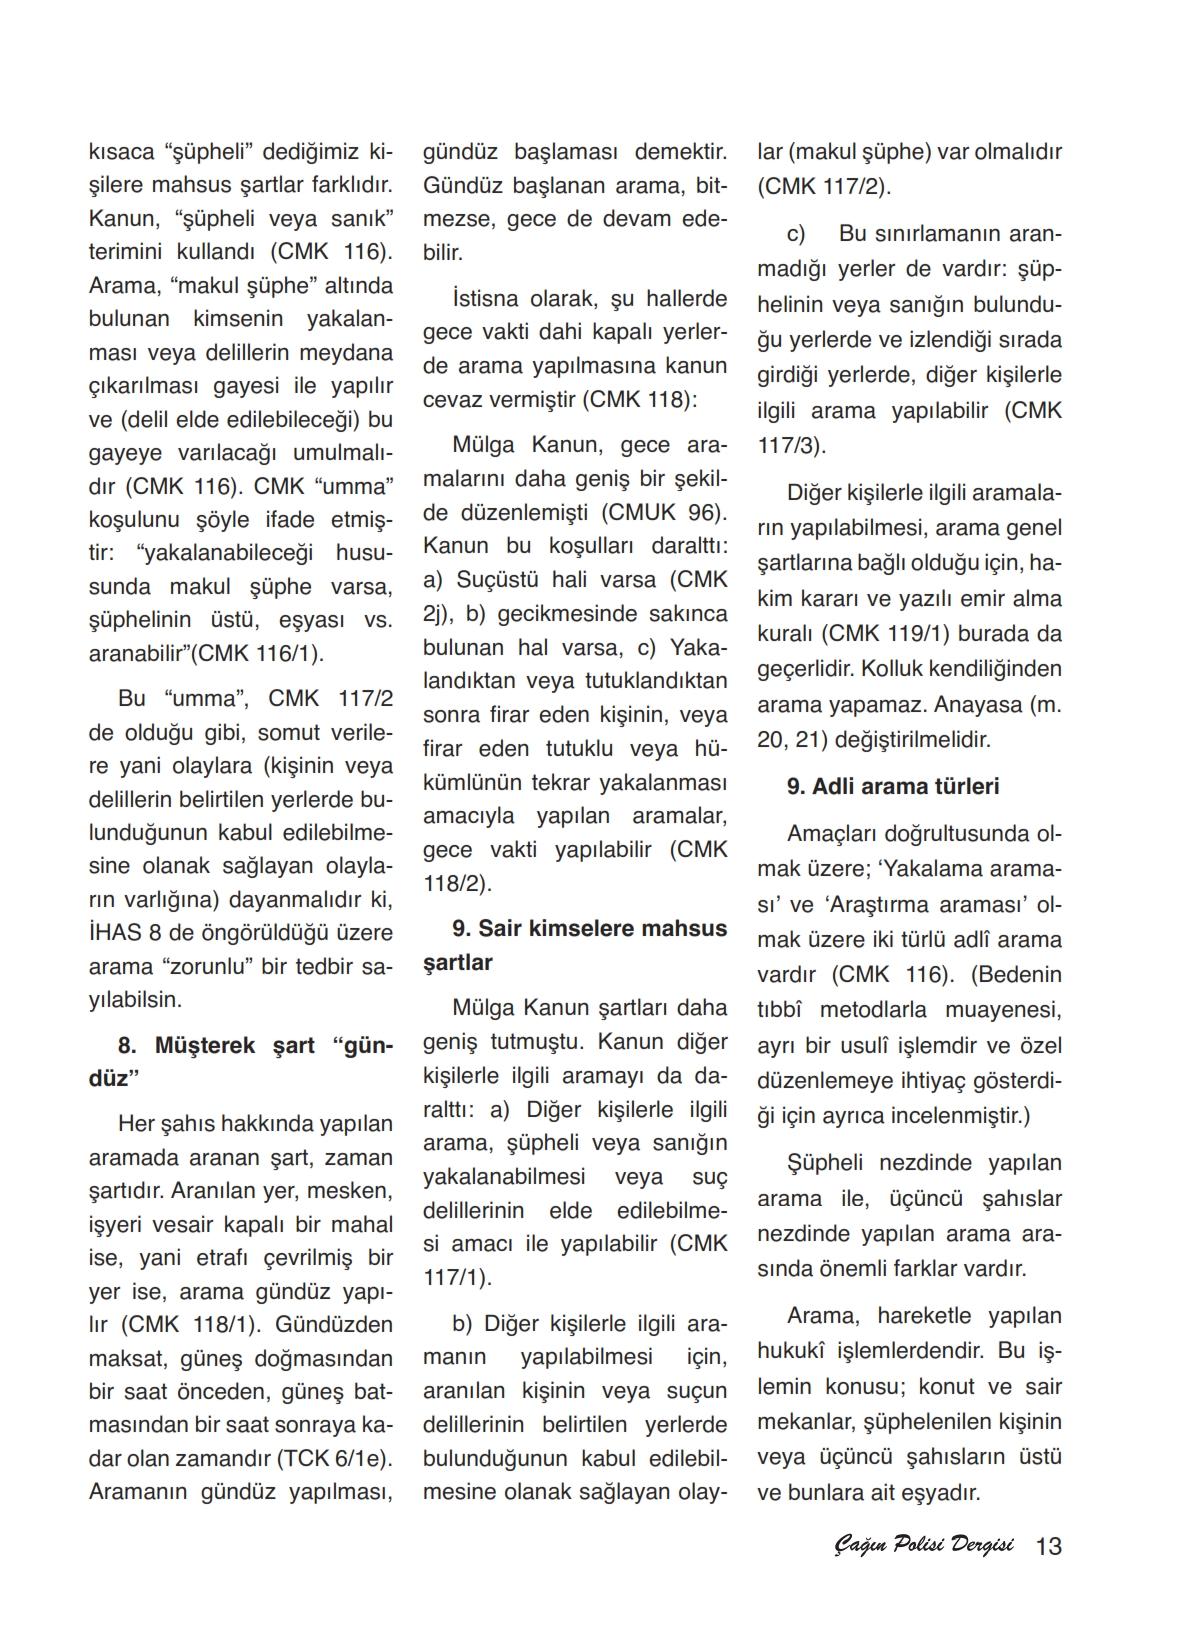 polis_dergi_aralik_2013_int_015